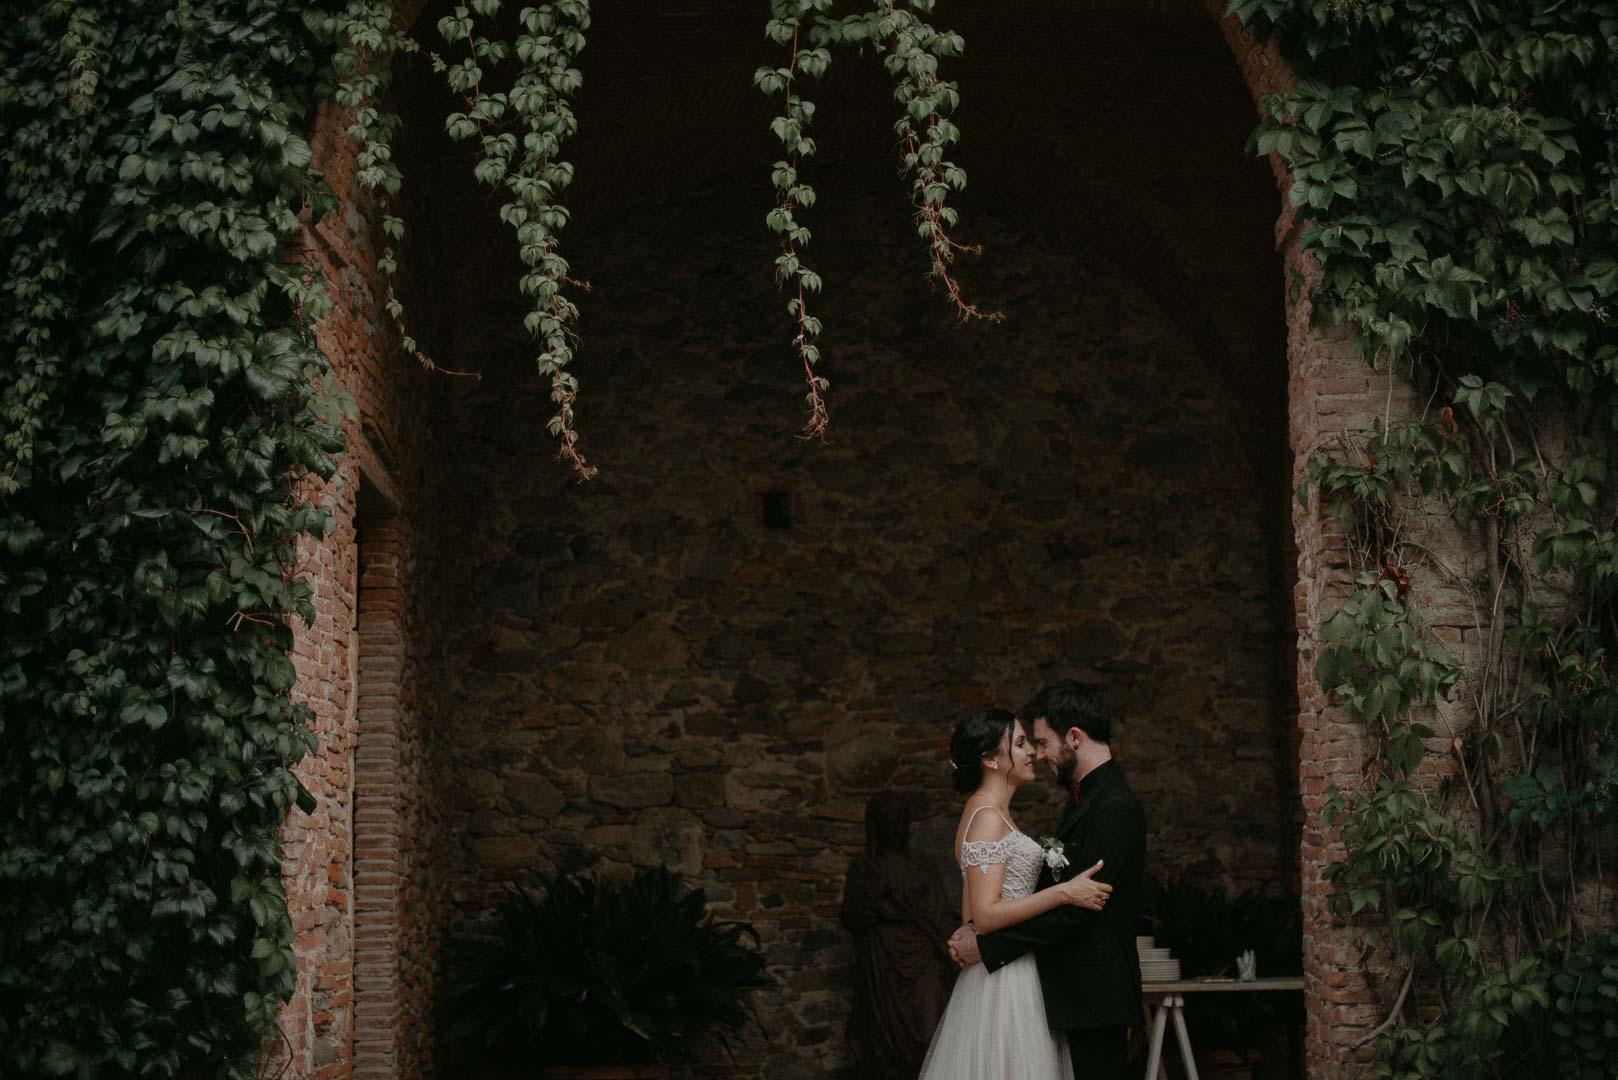 wedding-photographer-destination-fineart-bespoke-reportage-tuscany-villascorzi-vivianeizzo-spazio46-123